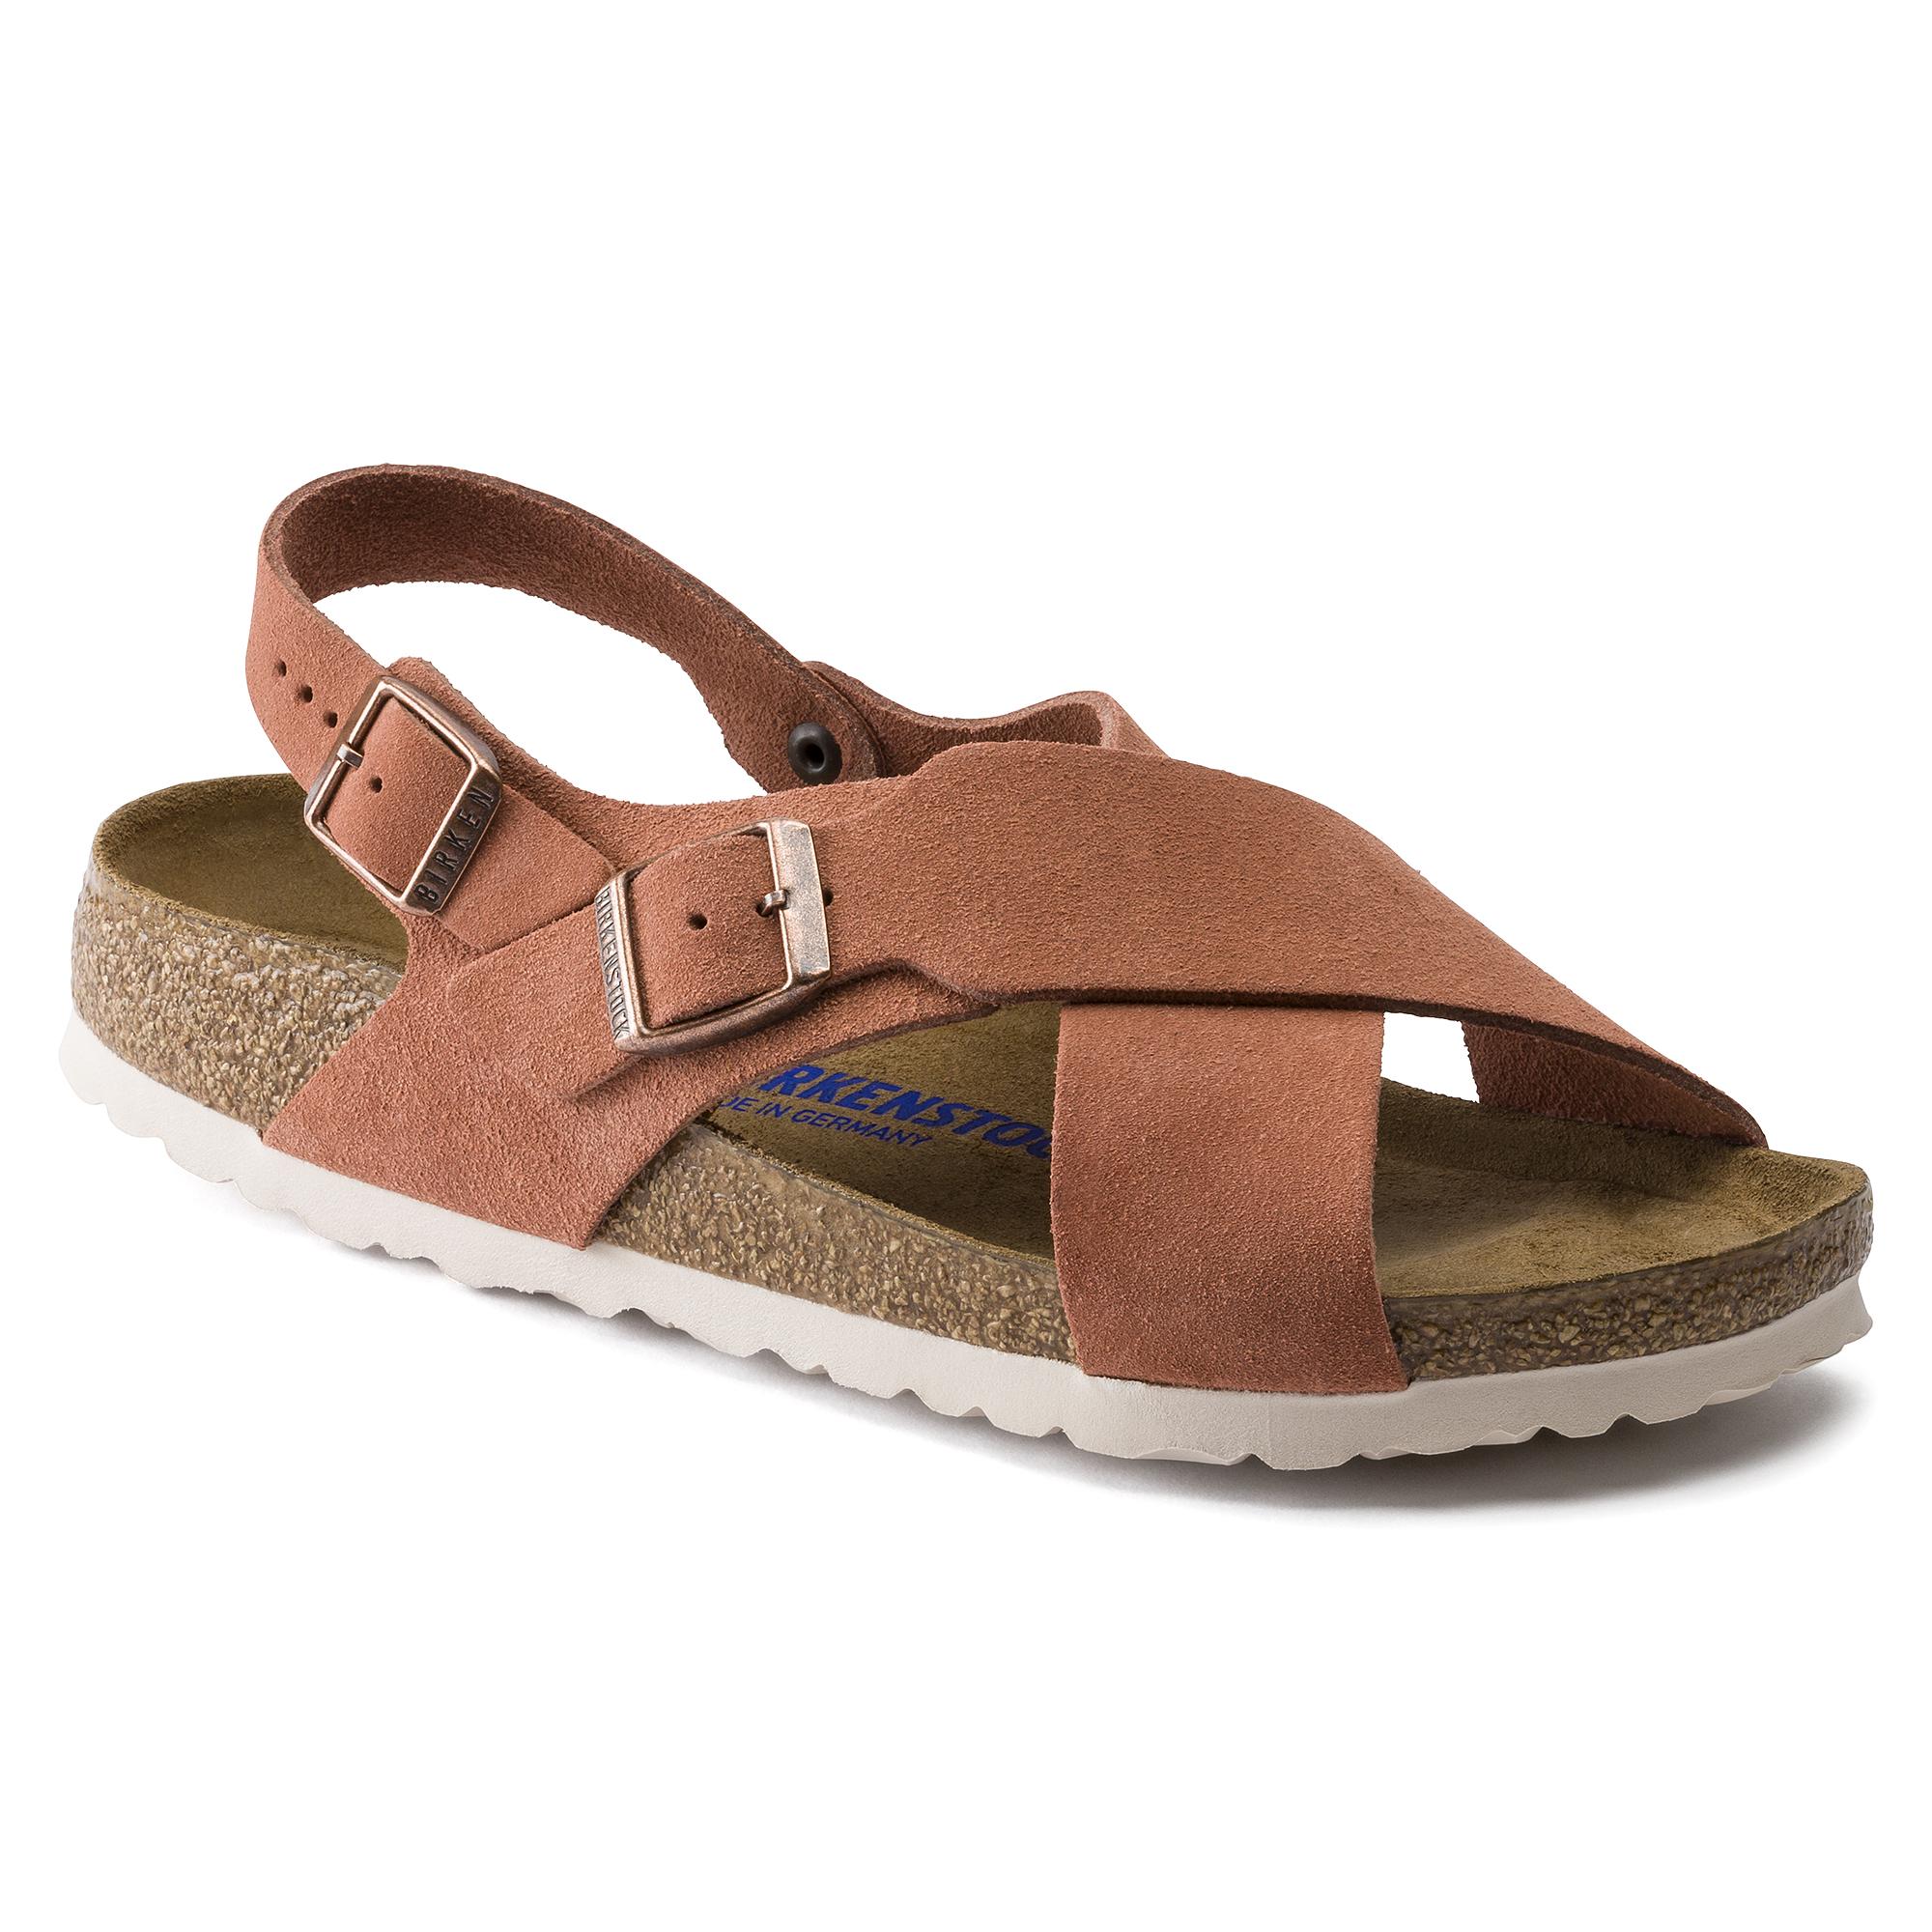 tulum suede sandal